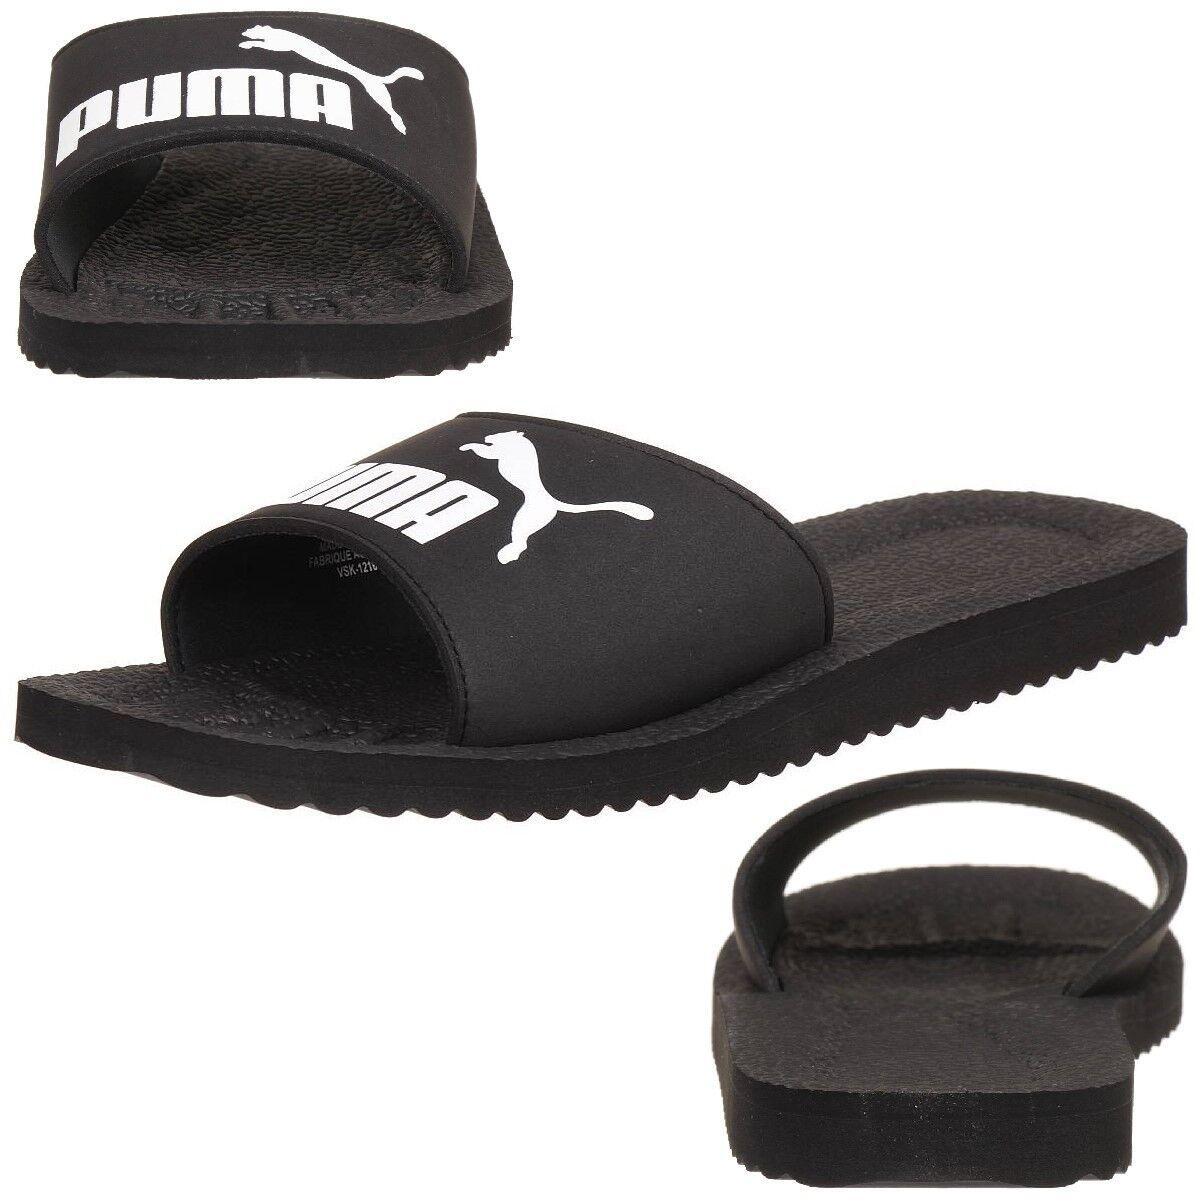 Puma Purecat Unisex-Erwachsene Sandalen Badelatschen Badelatschen Badelatschen schwarz 4d9dc8